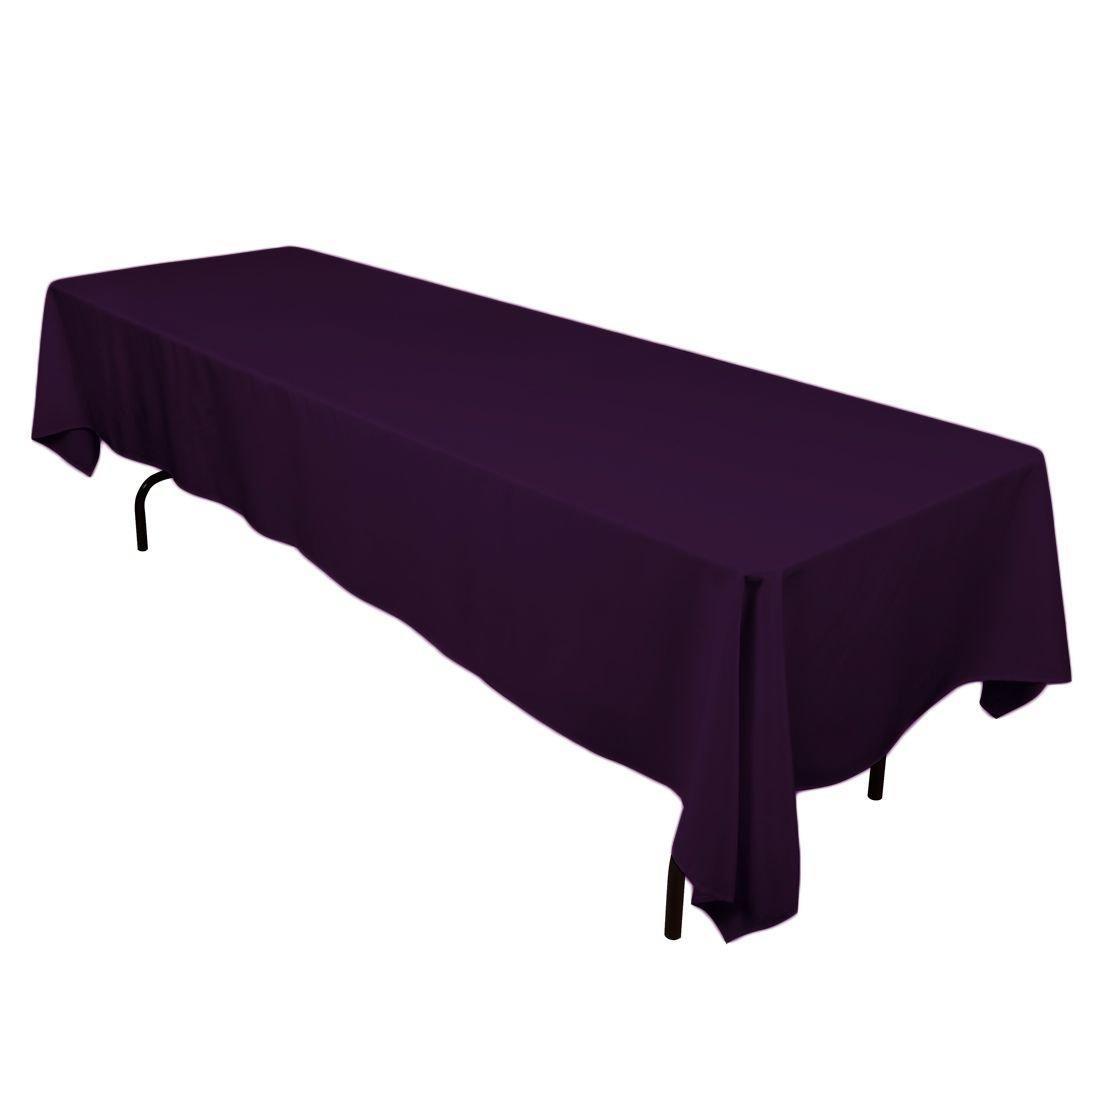 LinenTablecloth 60 x 126-Inch Rectangular Polyester Tablecloth Eggplant